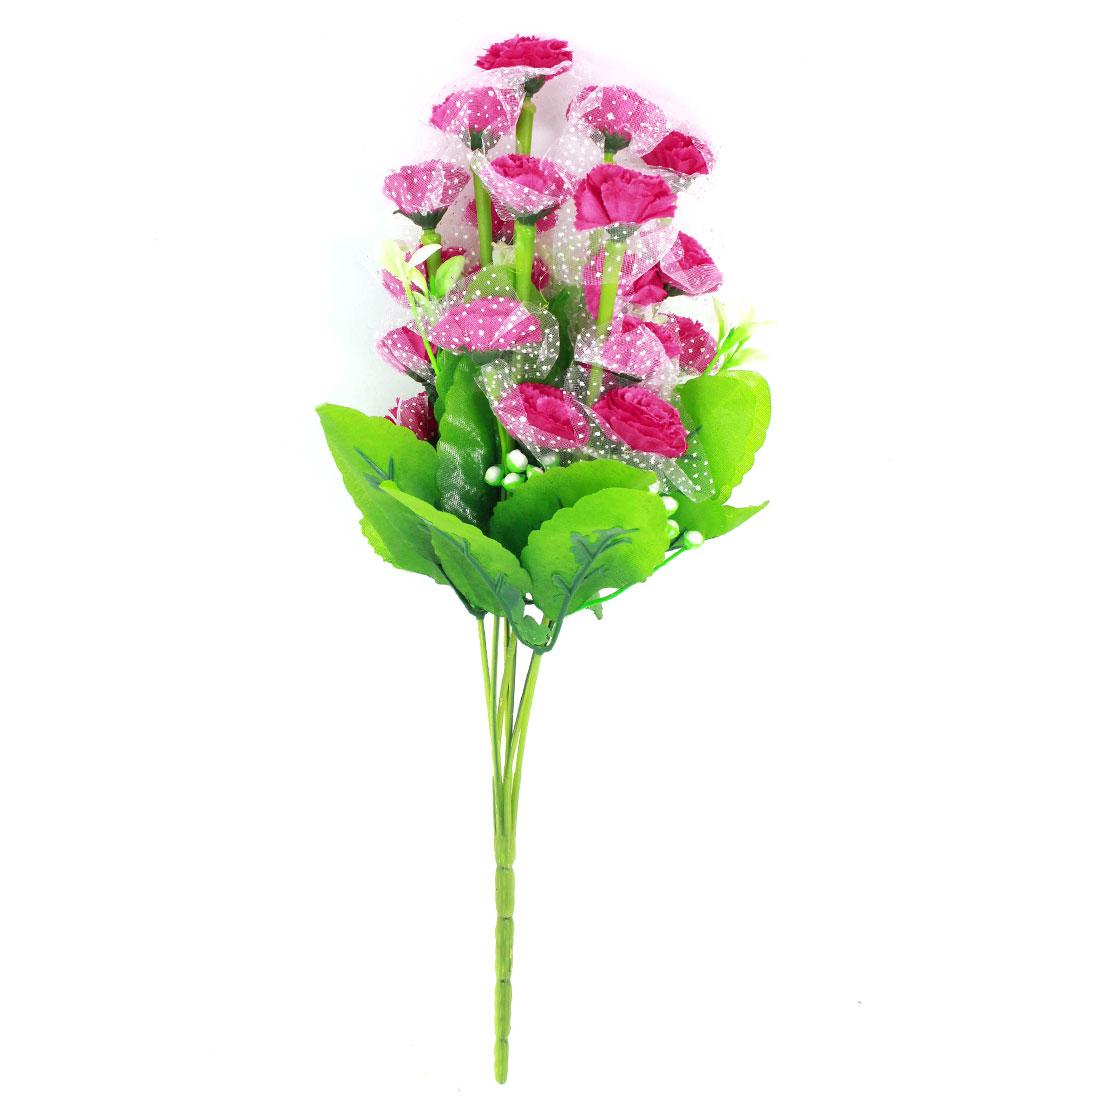 Bedroom Dormitory Decorative Simulation Plastic Flower Bouquet Fuchsia